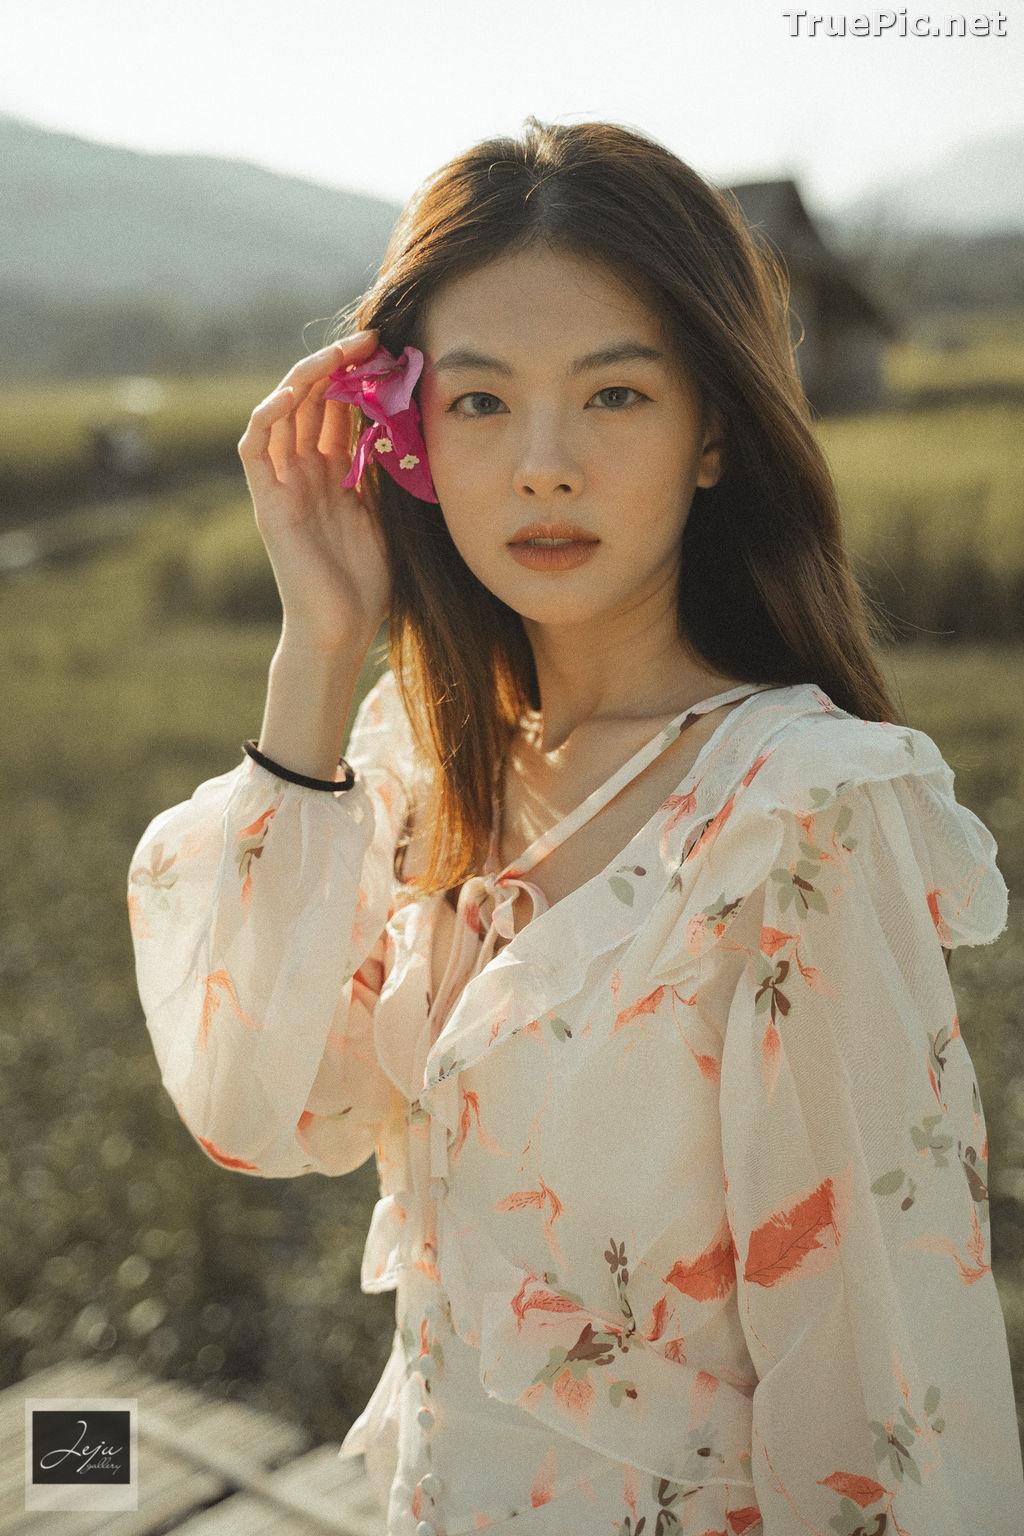 Image Thailand Hot Model - Nut Theerarat - Nutwch Black Pink - TruePic.net - Picture-4